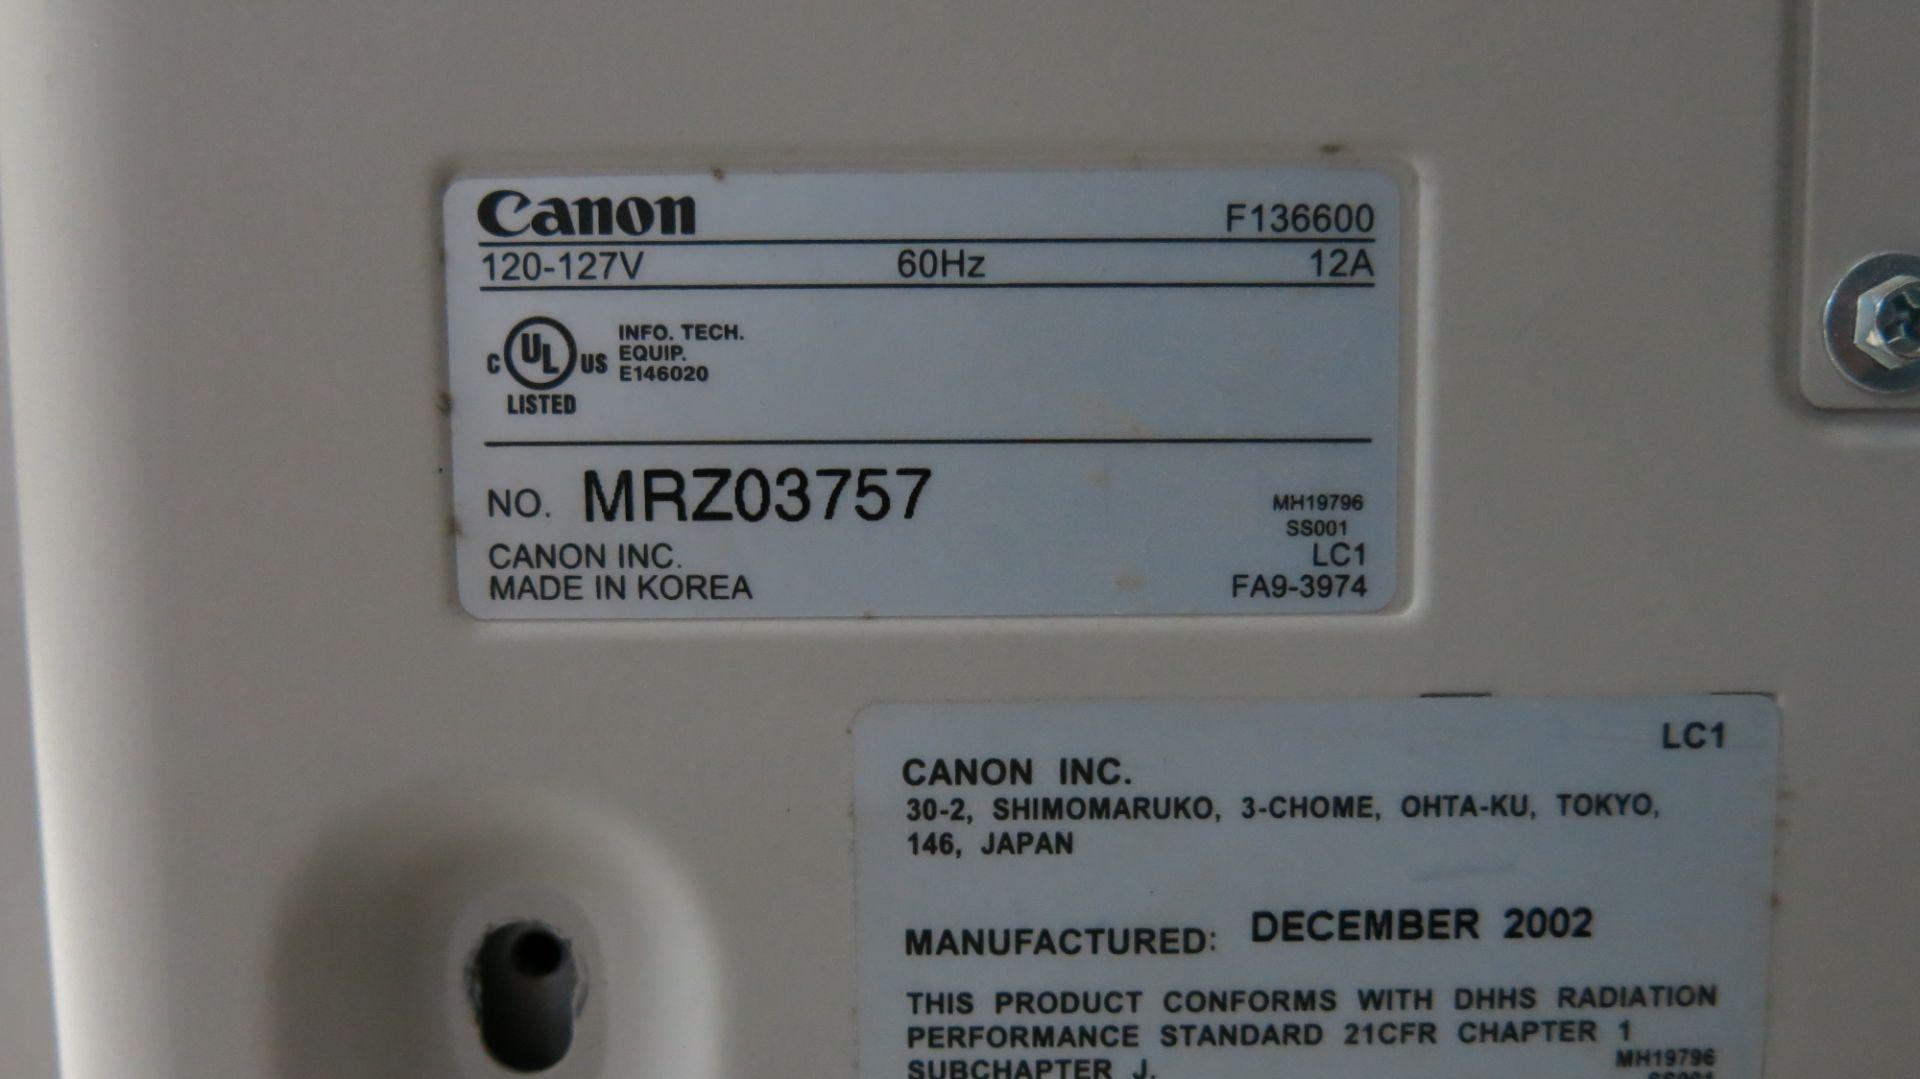 Lot 428 - CANON, F136600, MULTIFUNCTIONAL PHOTOCOPIER, S/N MRZ03757, 2002